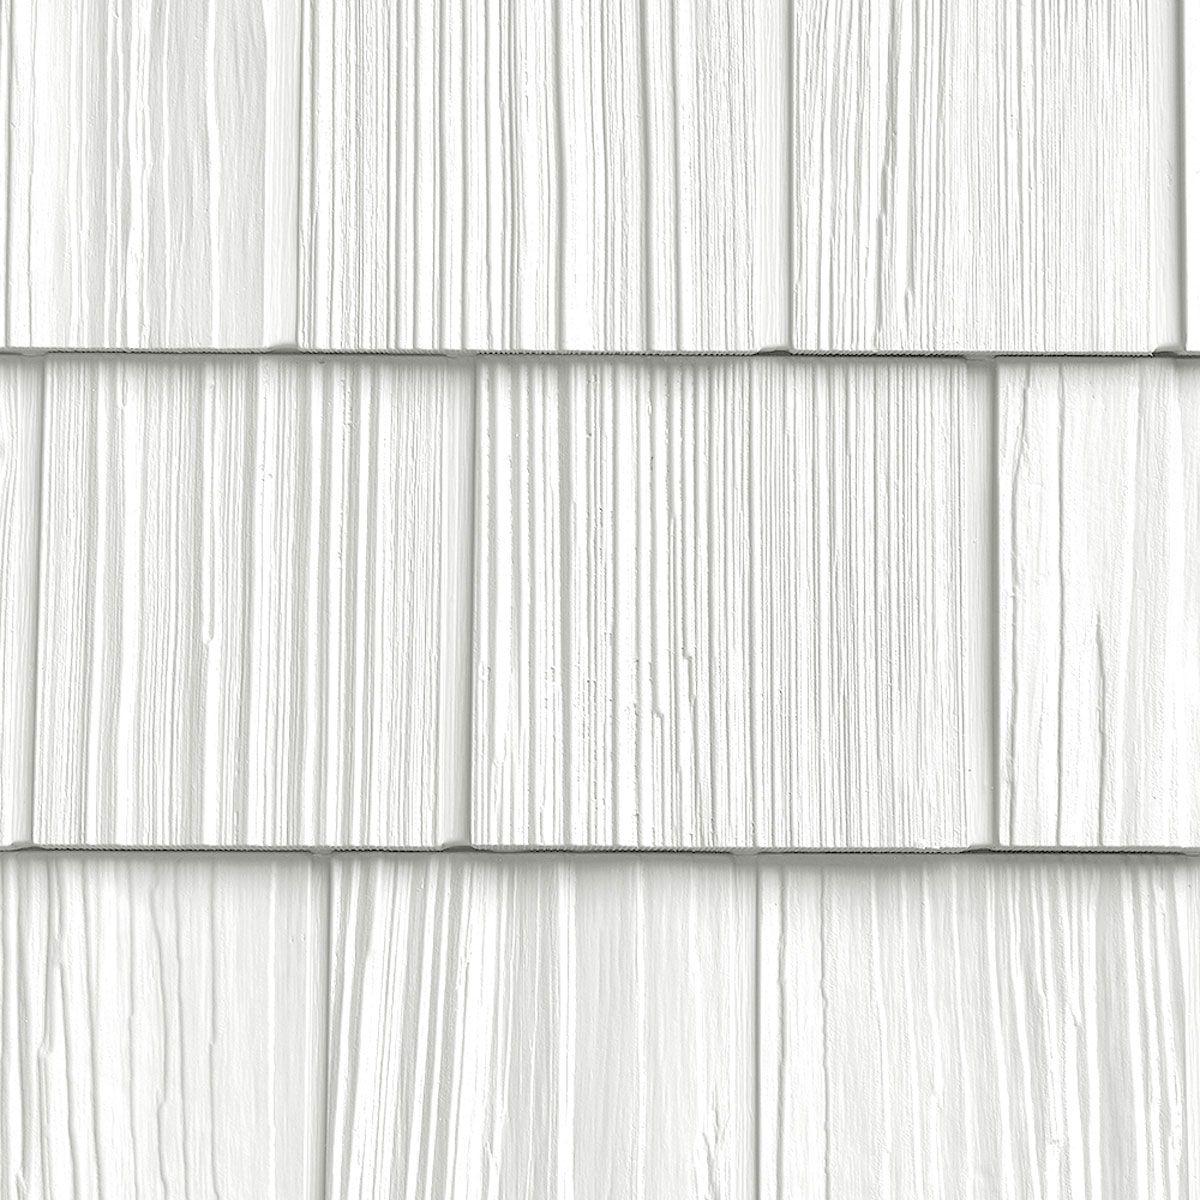 7 W X 60 3 4 L Exposure Vinyl Split Shakes 34 Panels Ctn 100 Sq Feet 834 Red Cedar Walmart Com In 2020 Vinyl Shake Siding Shingle Siding Clapboard Siding